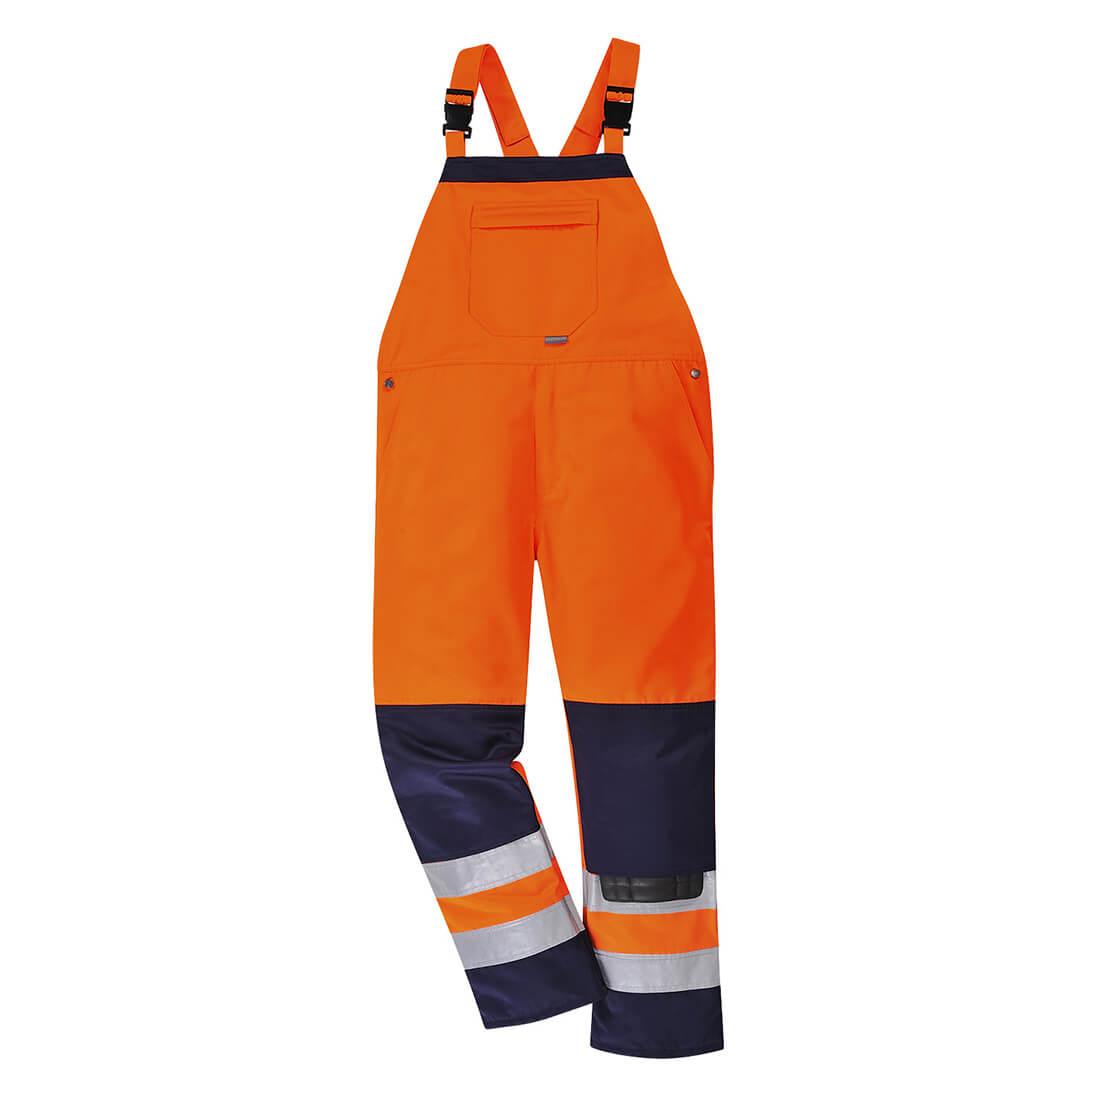 Portwest Girona Hi Vis Bib & Brace Orange / Navy L